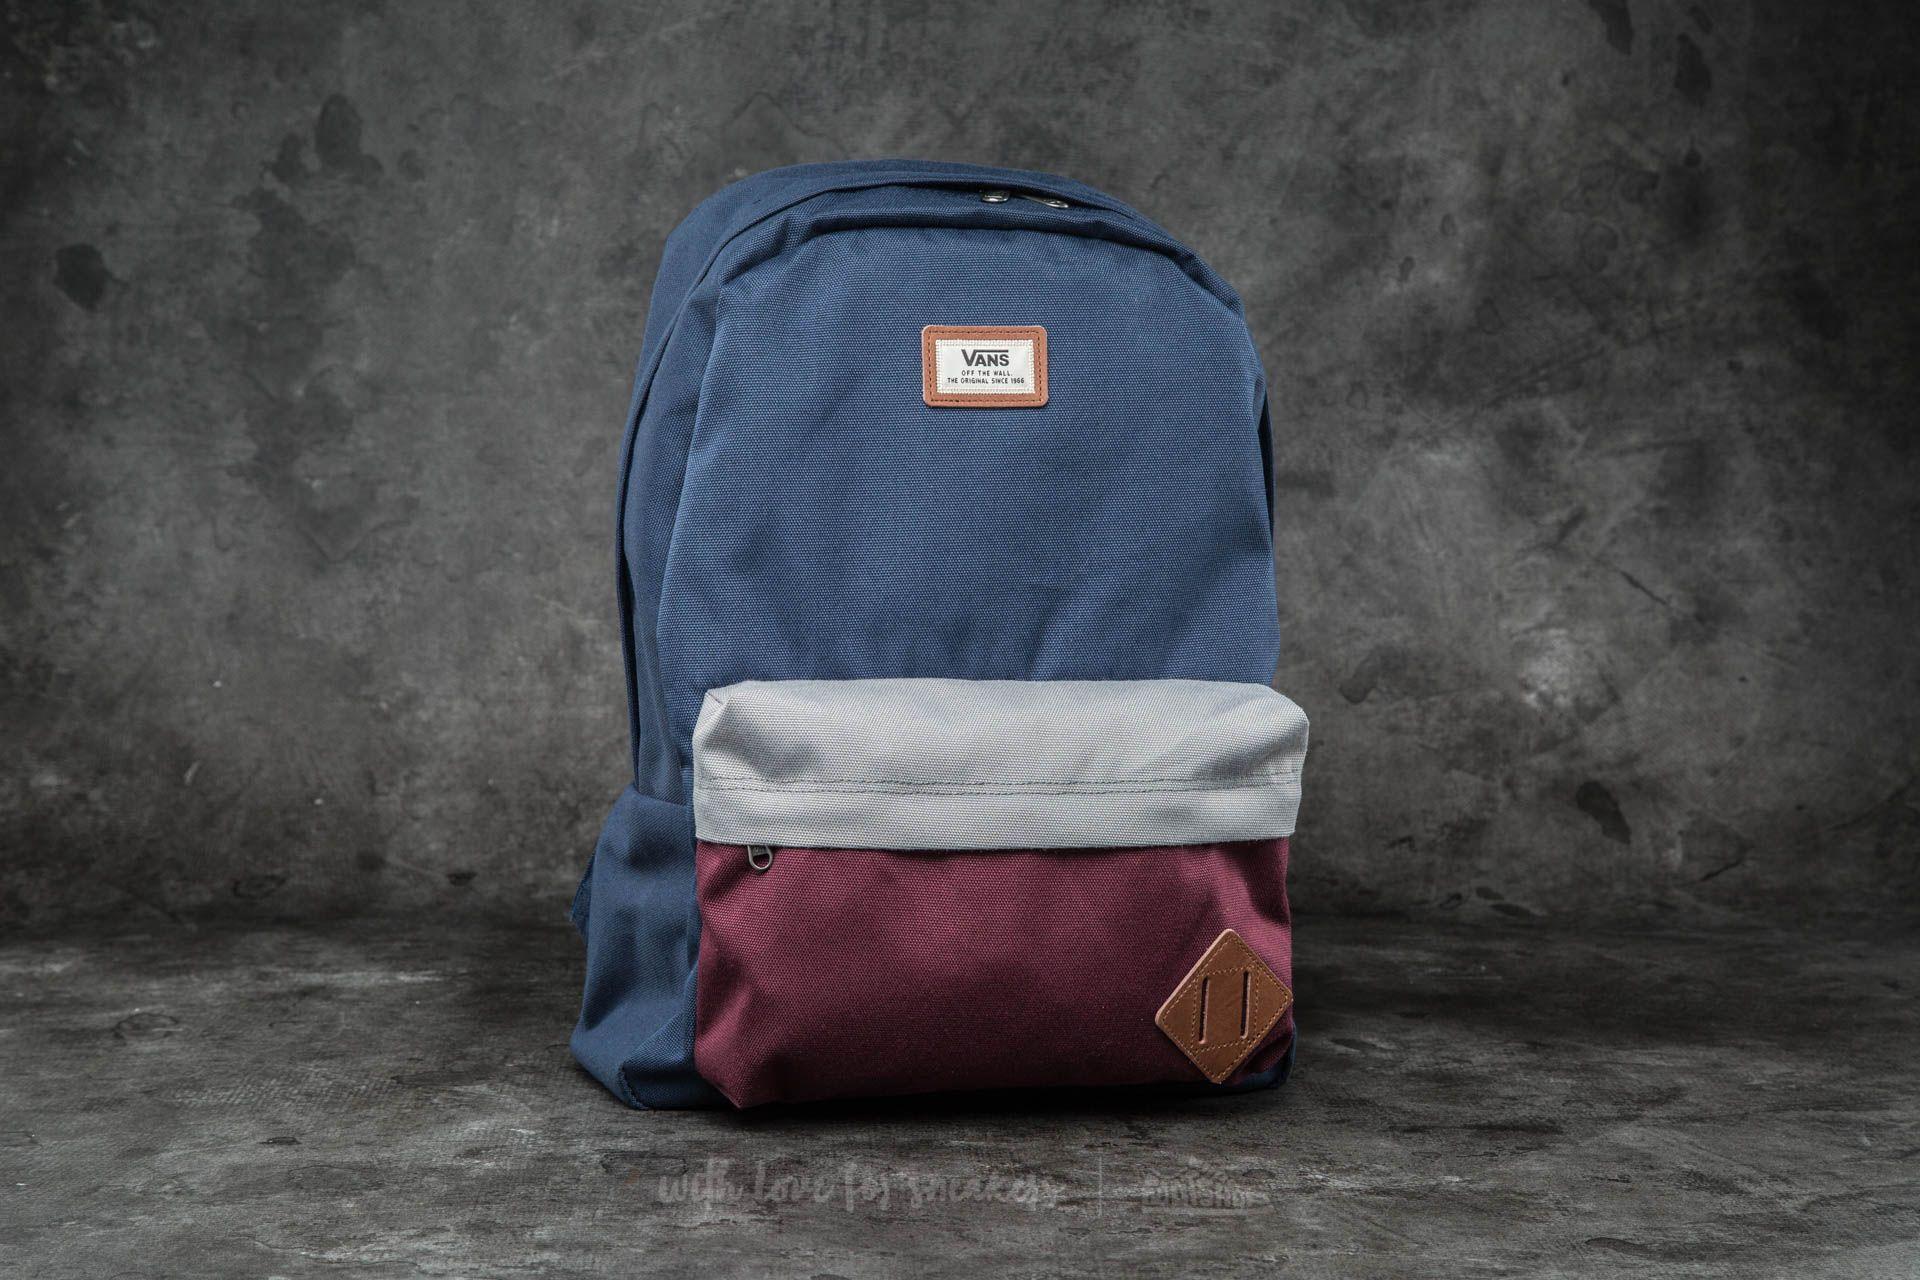 d8fa08fb9b4 Vans Old Skool II Backpack Port Royale Colorblock